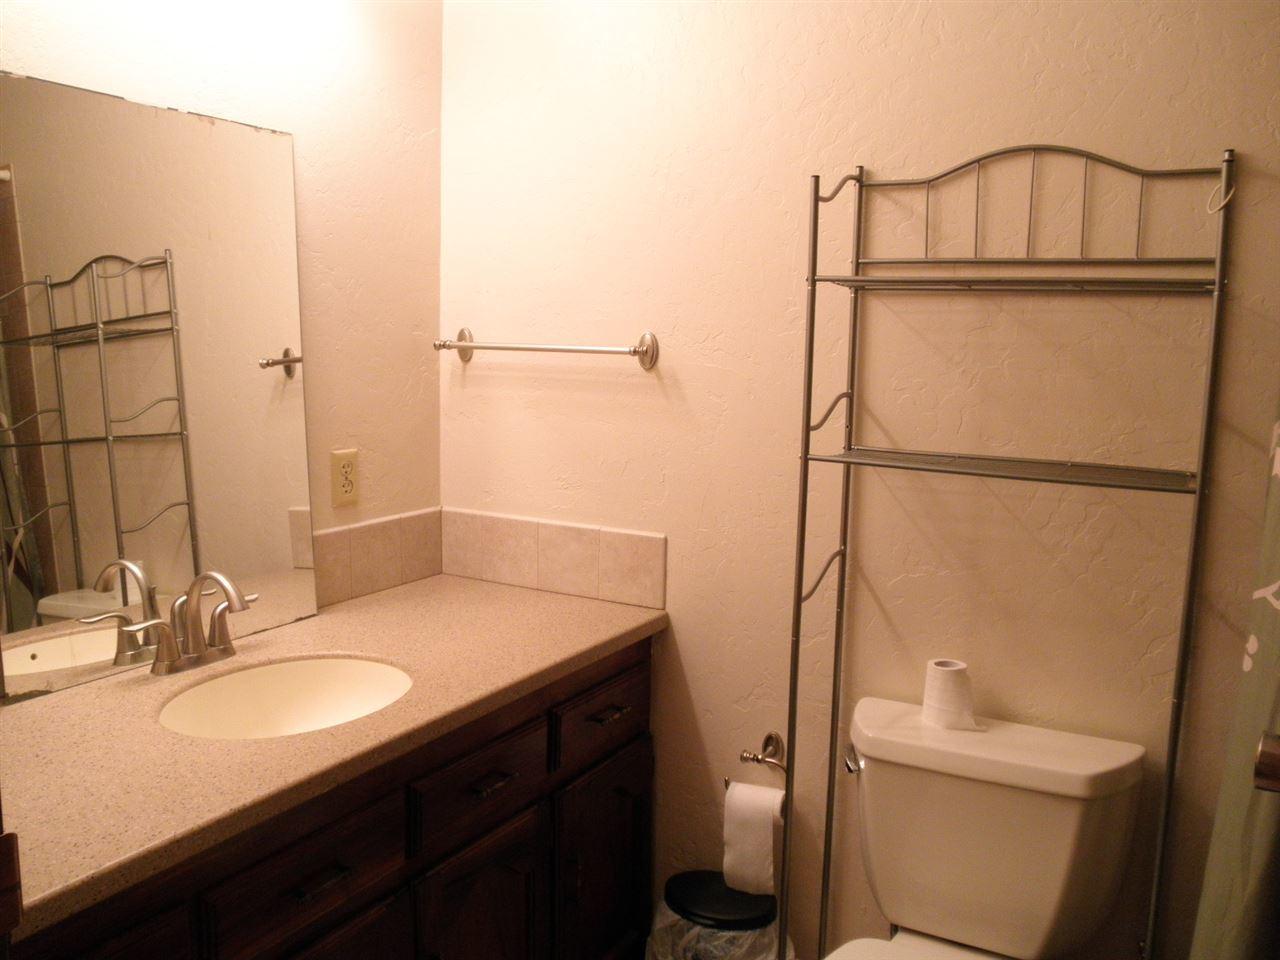 Sold Cross Sale W/ MLS | 4251 E Hubbs Estate Road  Ponca City, OK 74604 17